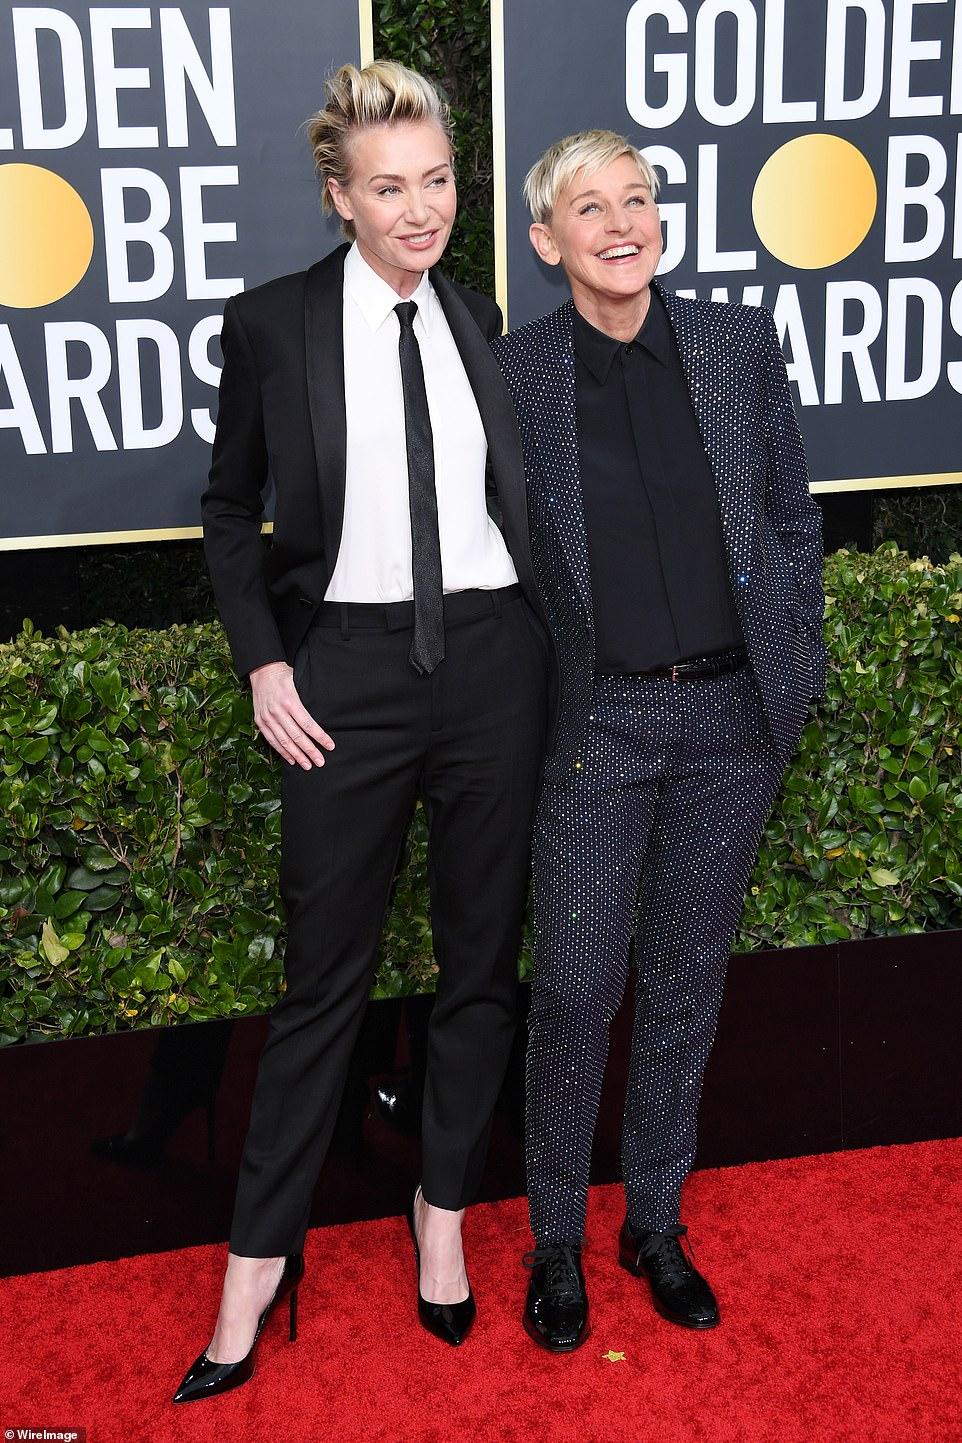 Red Carpet bling Ellen DeGeneres Wears Her Glittering Black Suit with Rhinestones